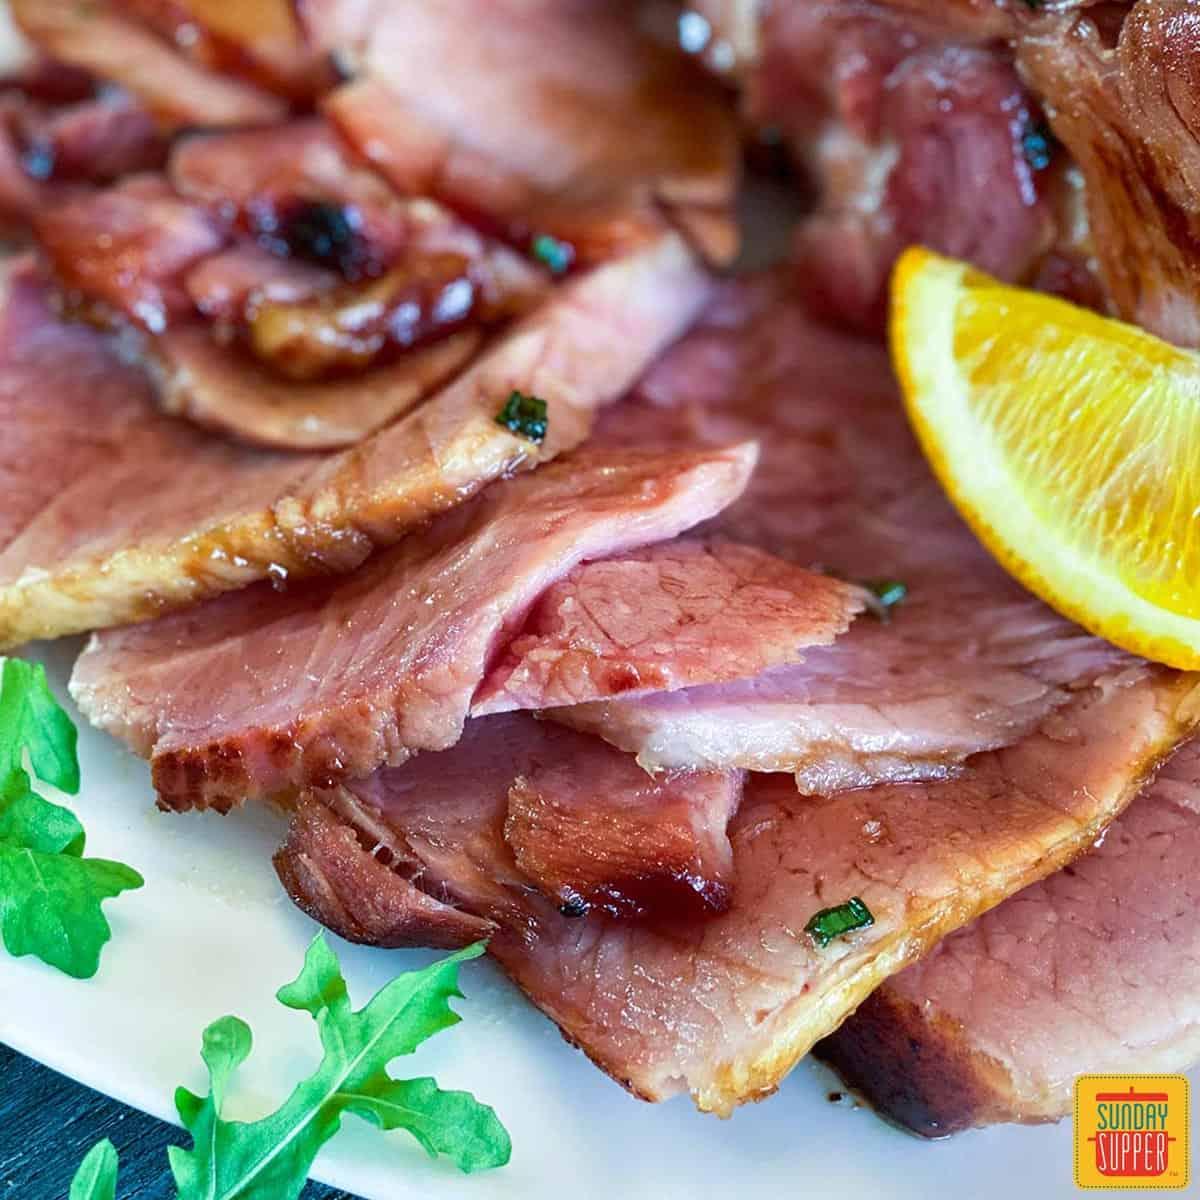 Sliced ham with oranges and arugula